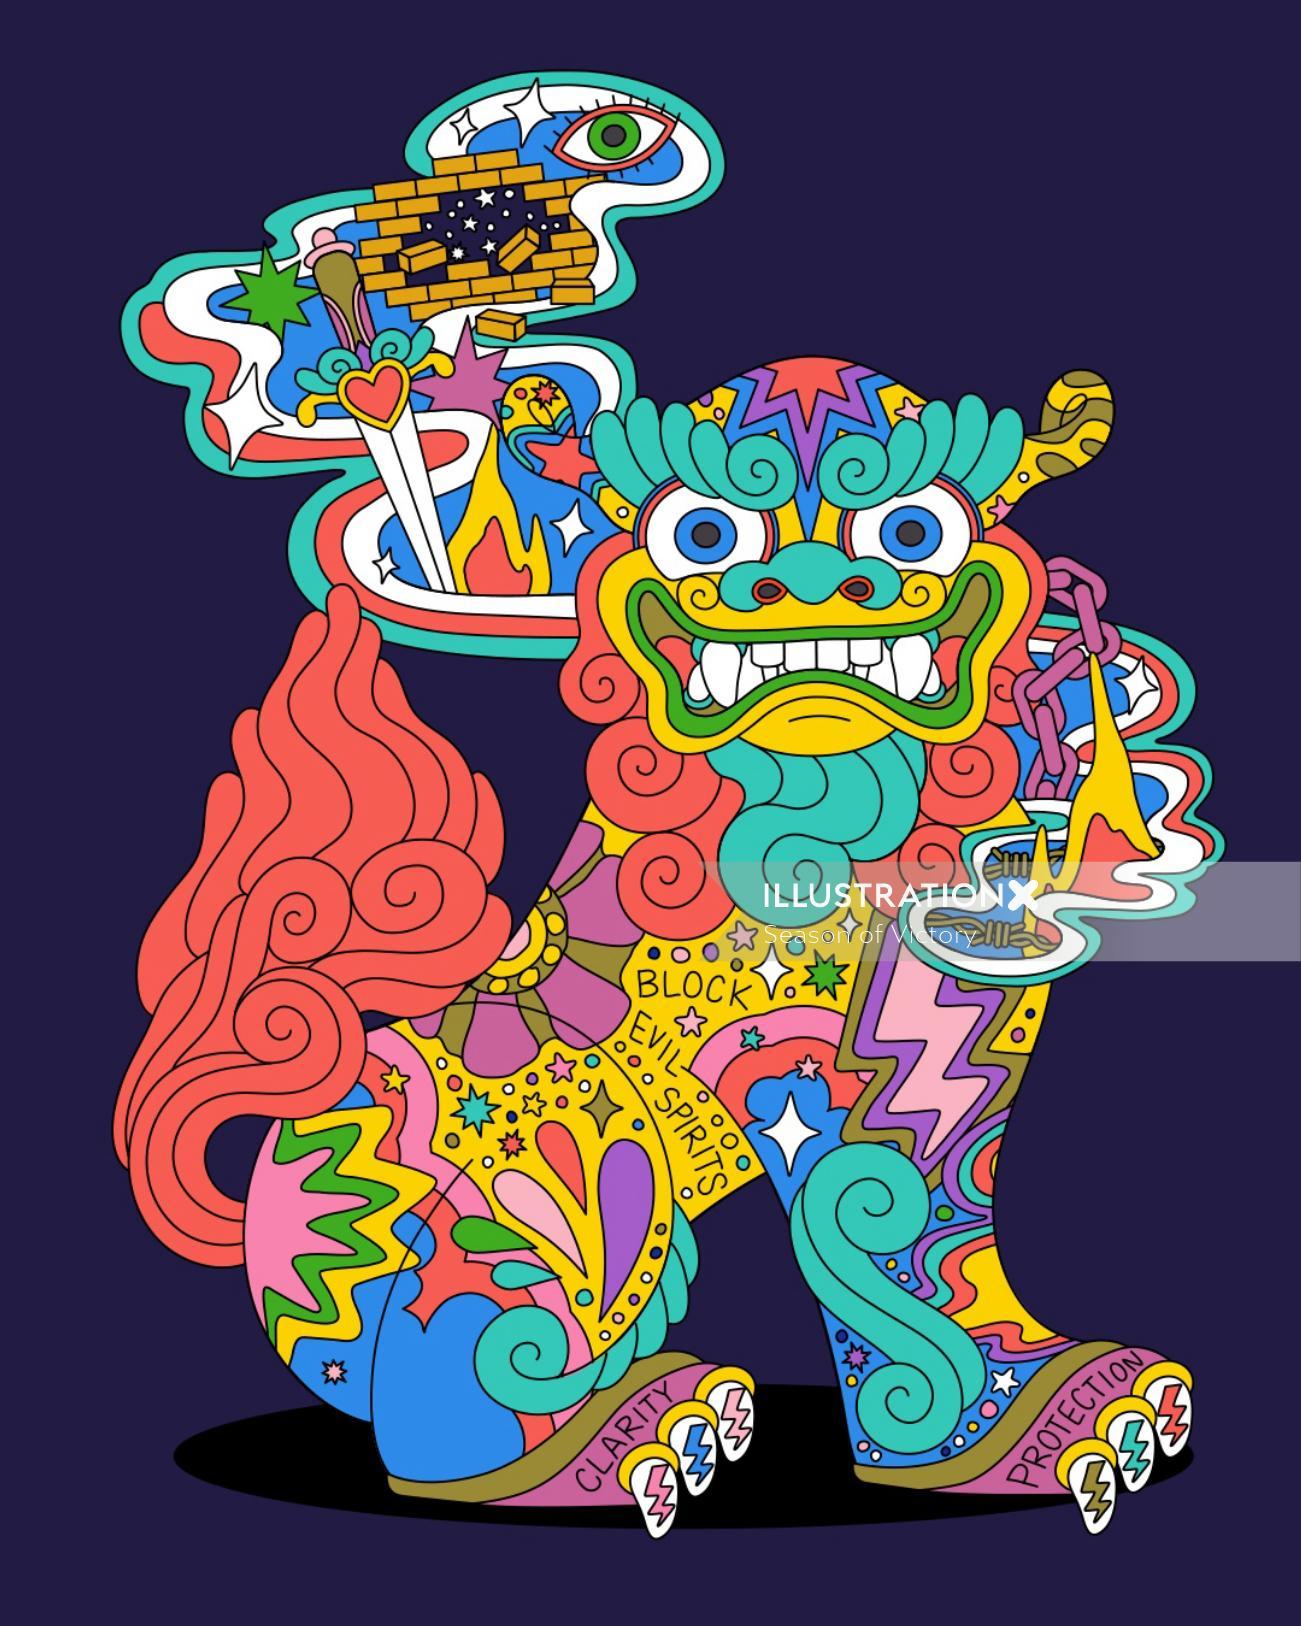 dog, shisadog, shisa, okinawa, okinawan, okinawan shisa dog, aapi, asian american illustrator